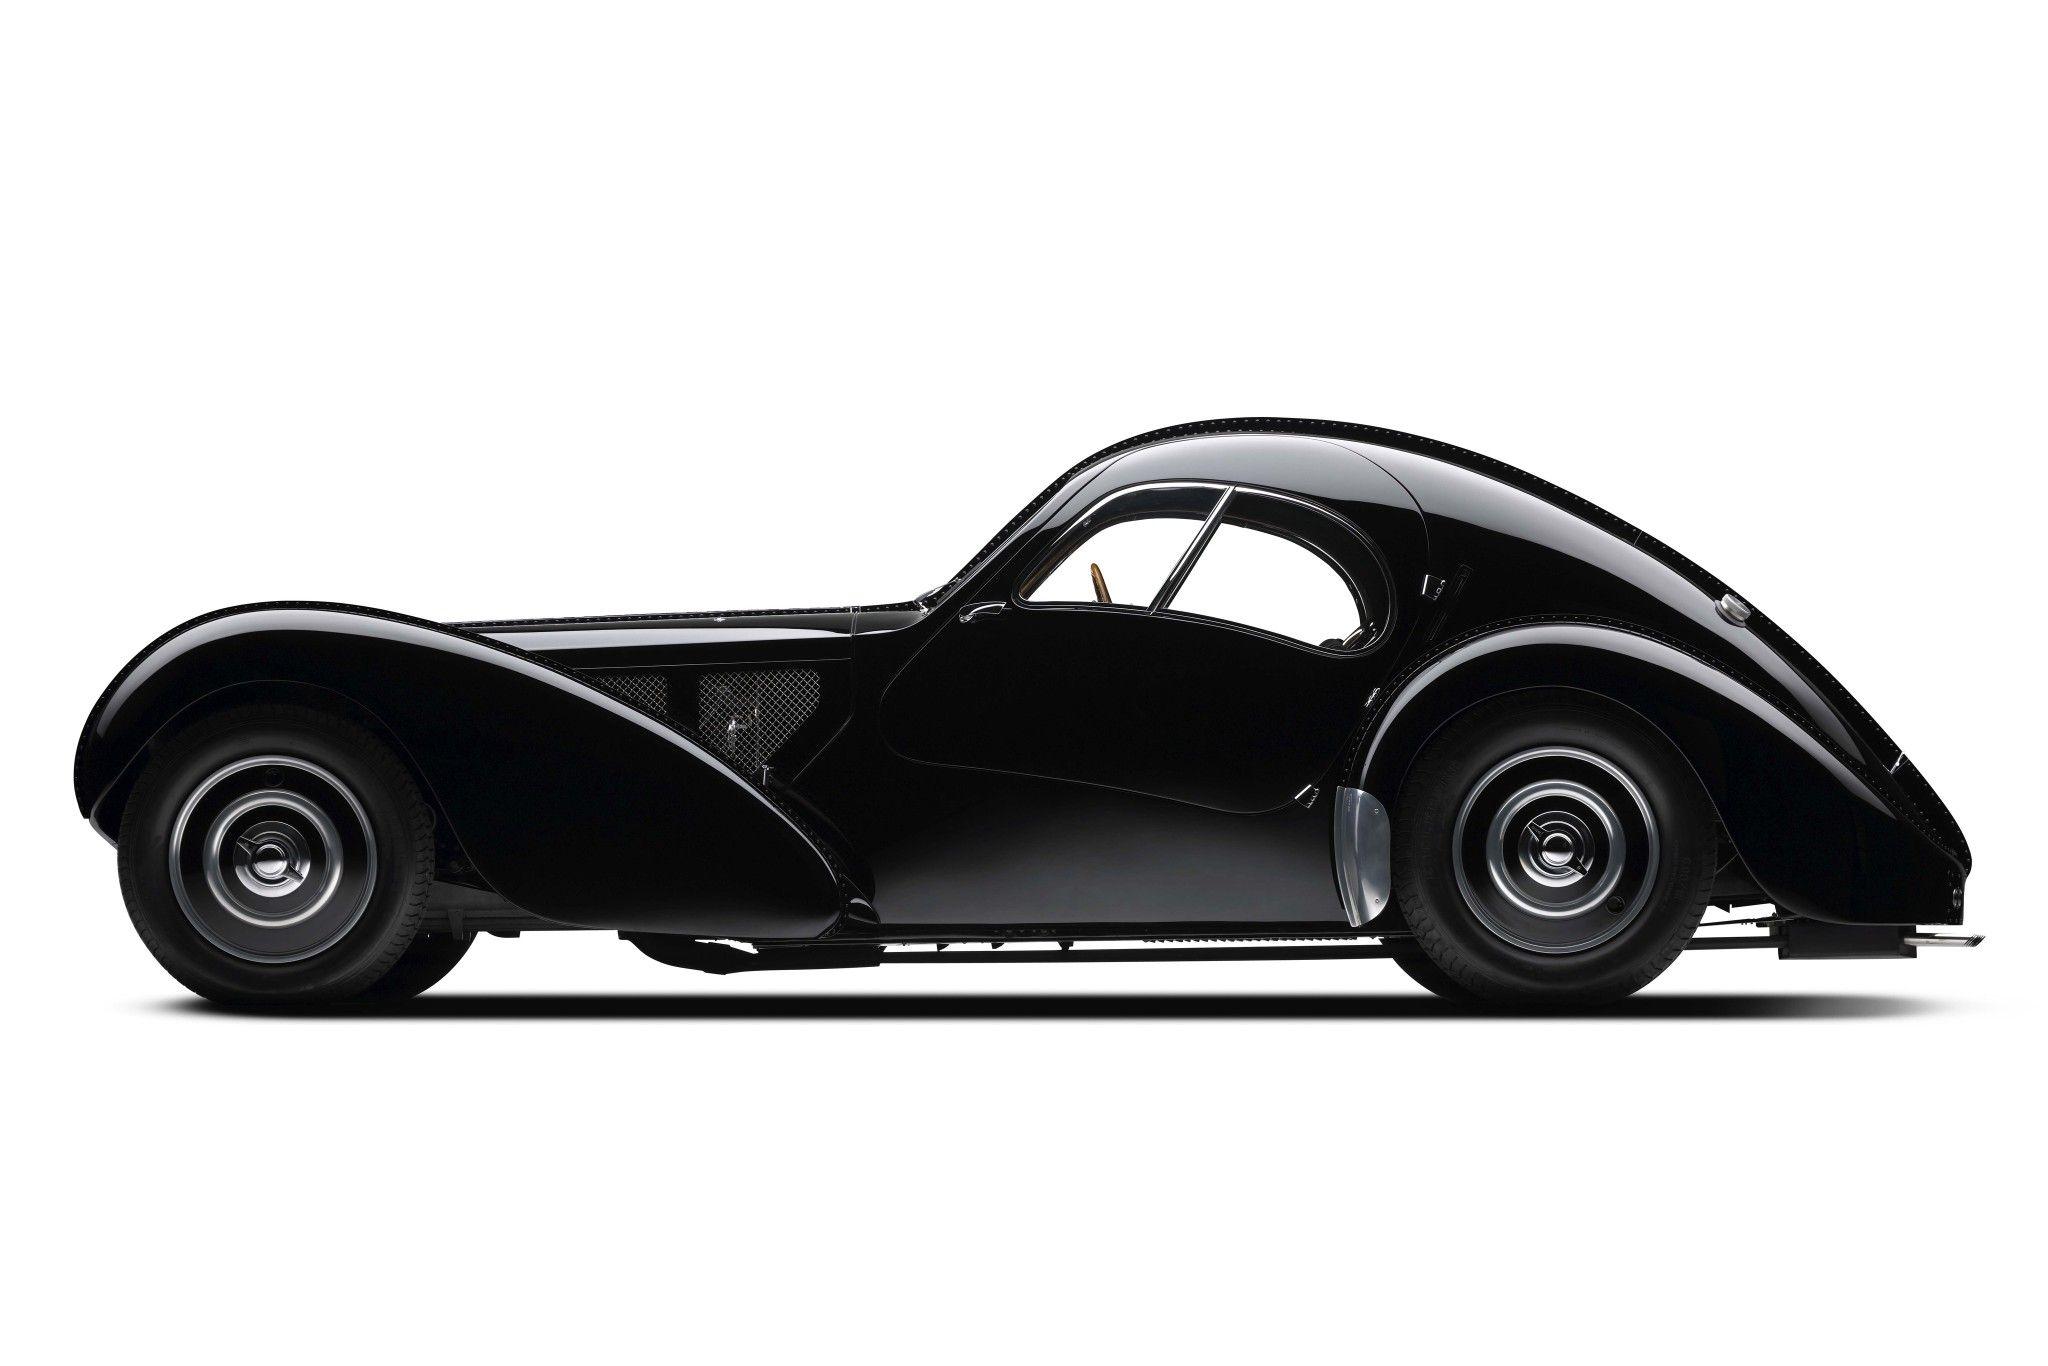 1938 Bugatti Type 57sc Atlantic 57591 In 2020 Klassieke Auto S Auto Volkswagen